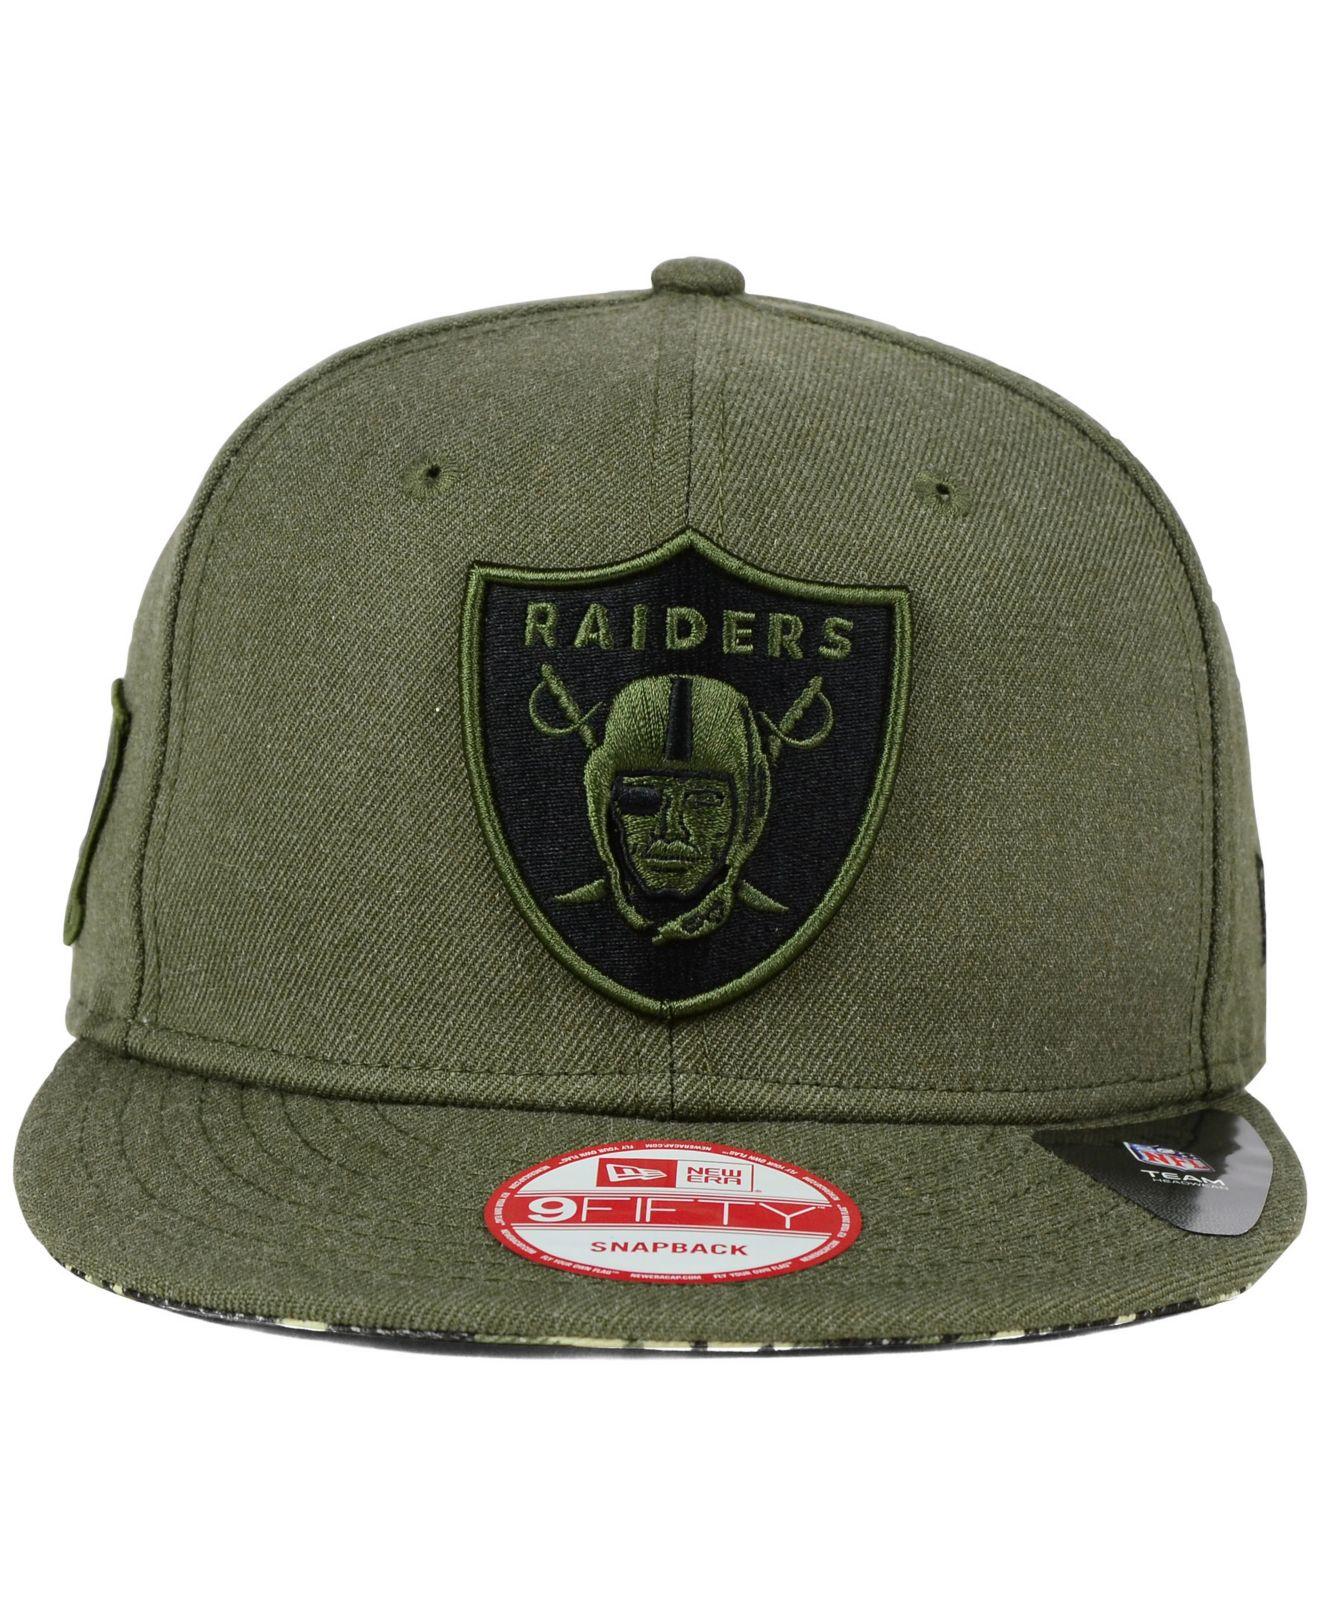 2500a63b9853a4 ... hat fba27 c95da new style lyst ktz oakland raiders camo 9fifty snapback  cap in green for men e561c 91fb7 ...